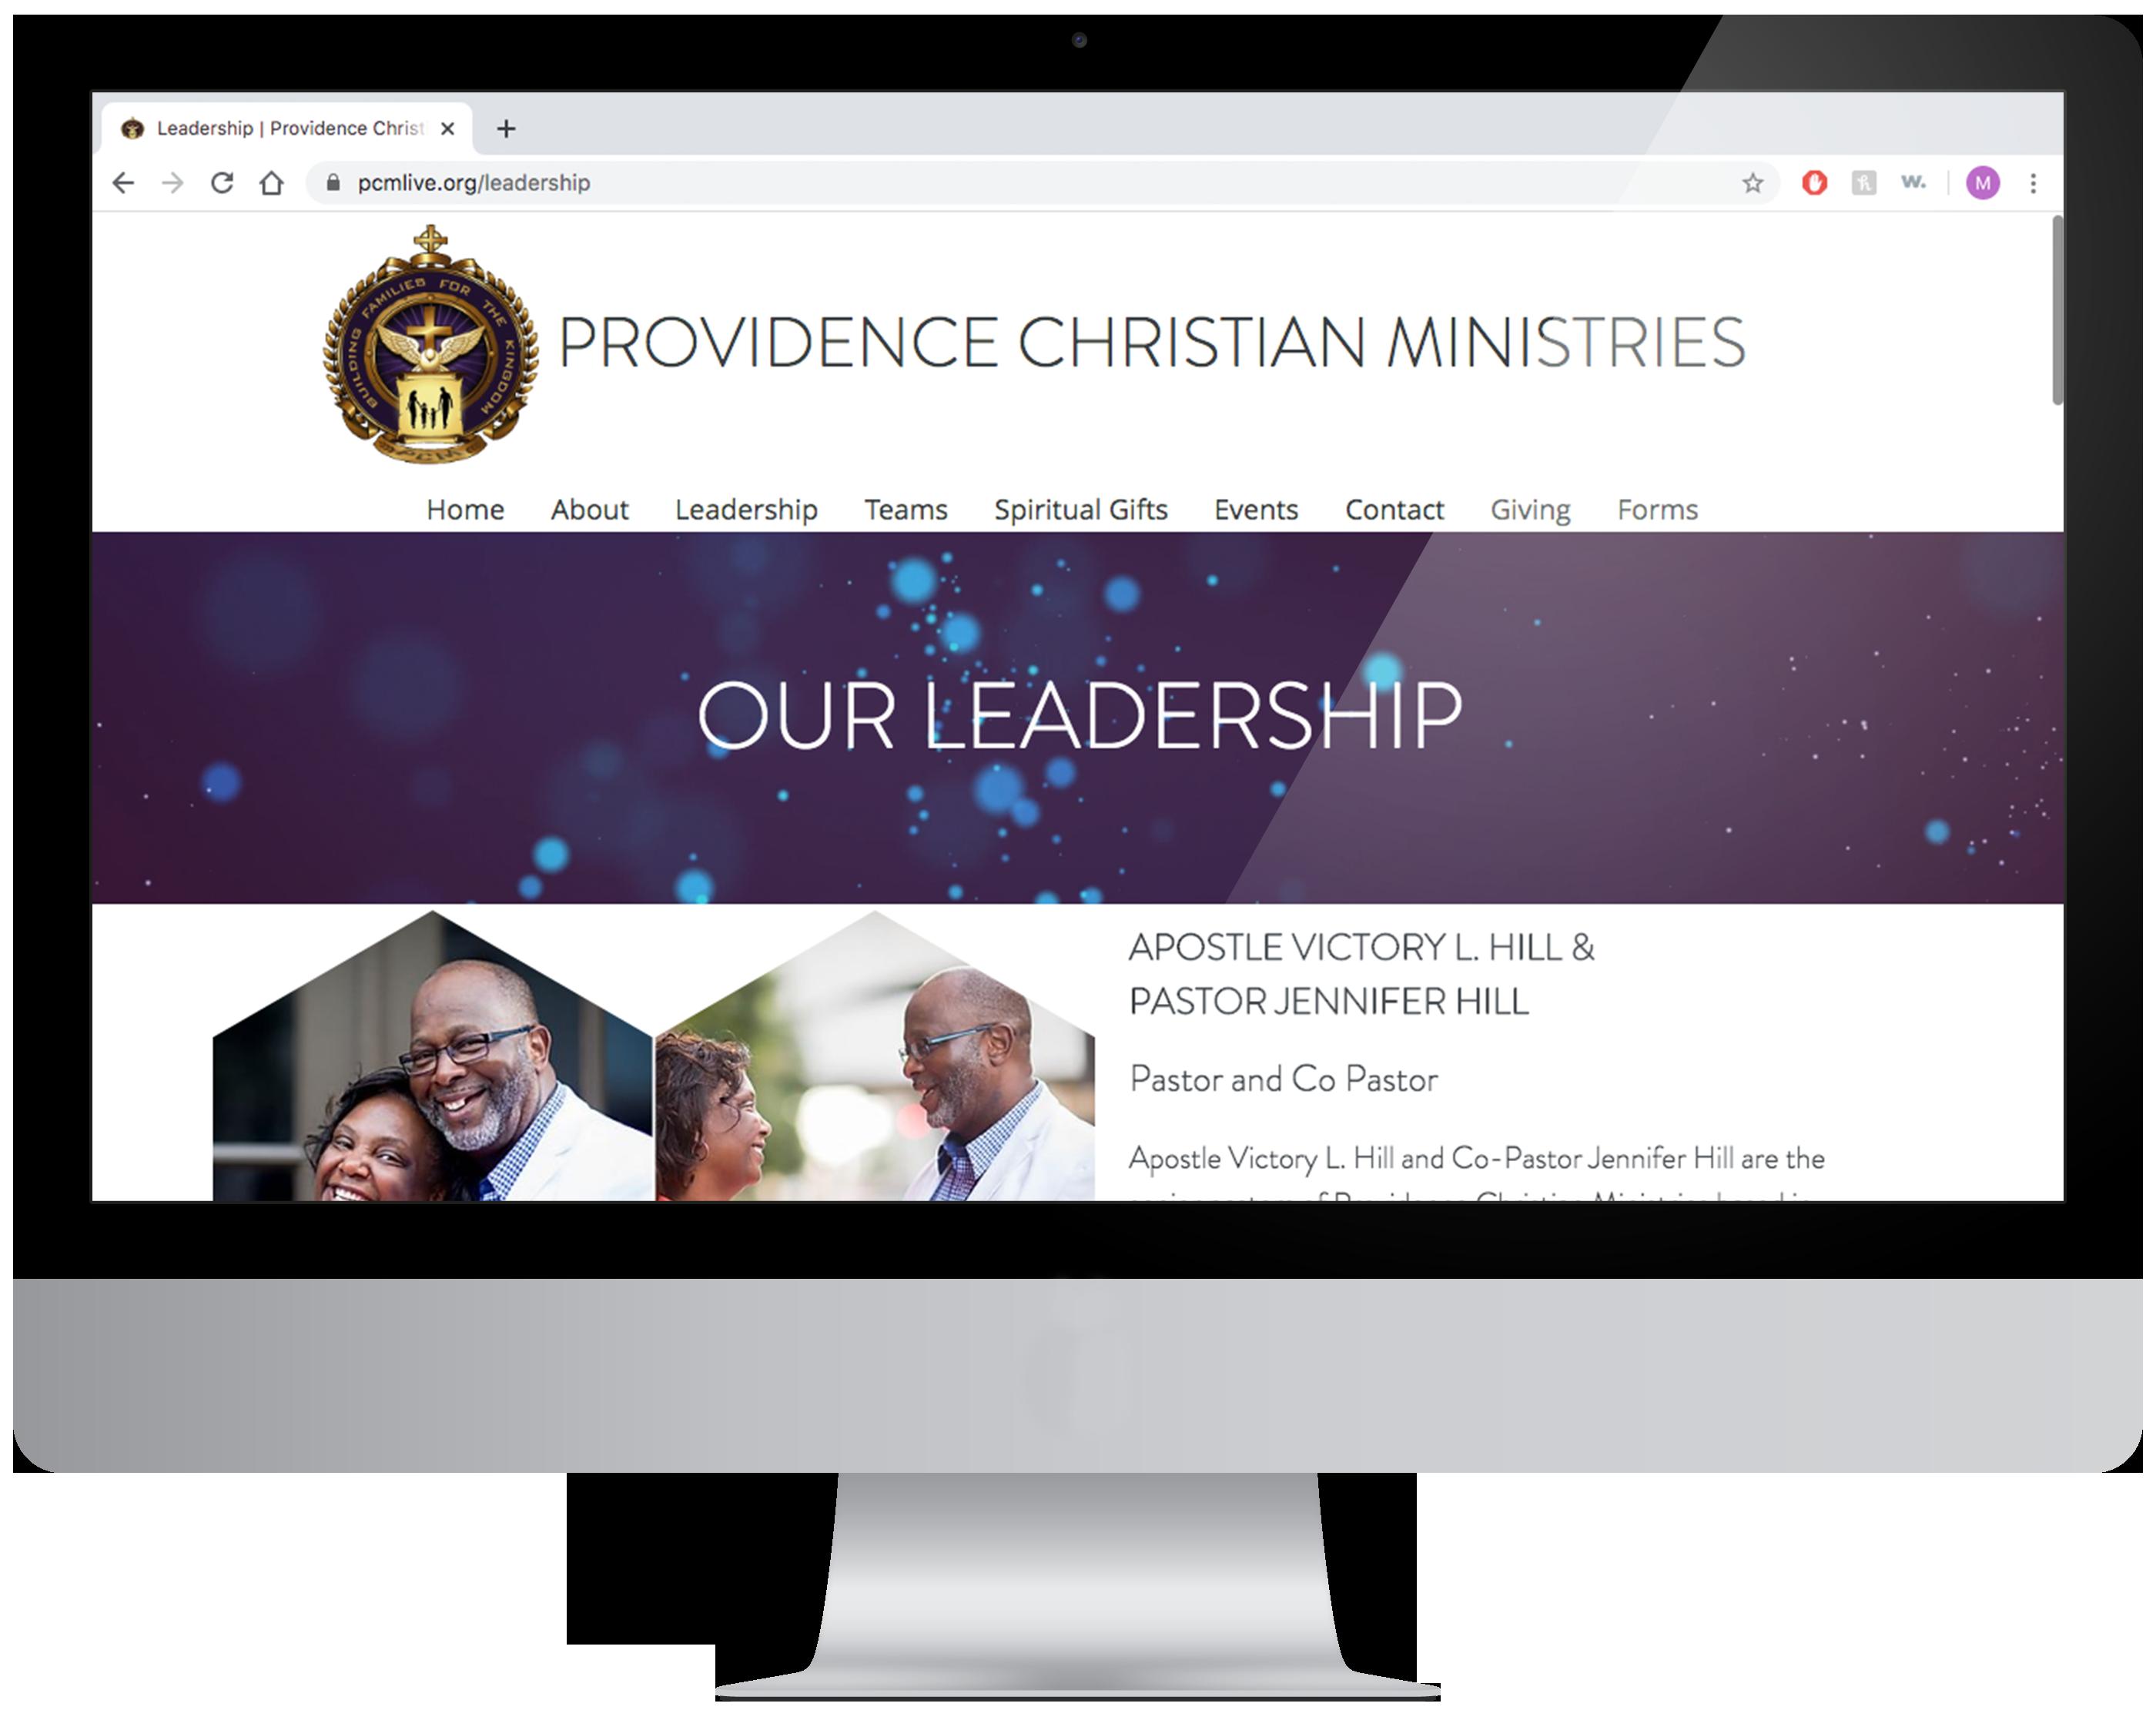 Providence Christian Ministires